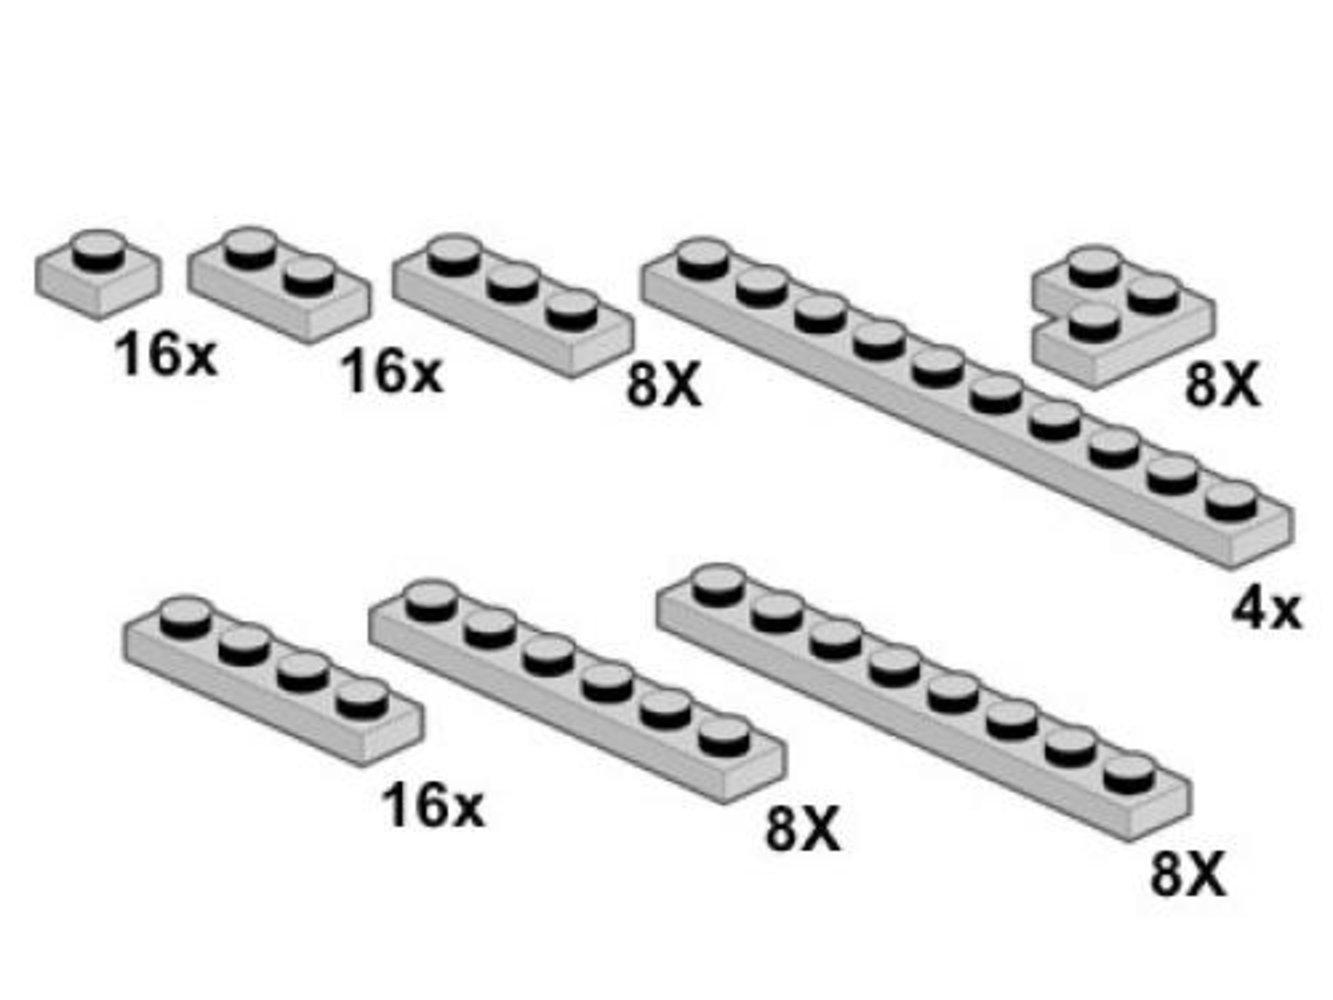 Light Gray Plates 1 x n